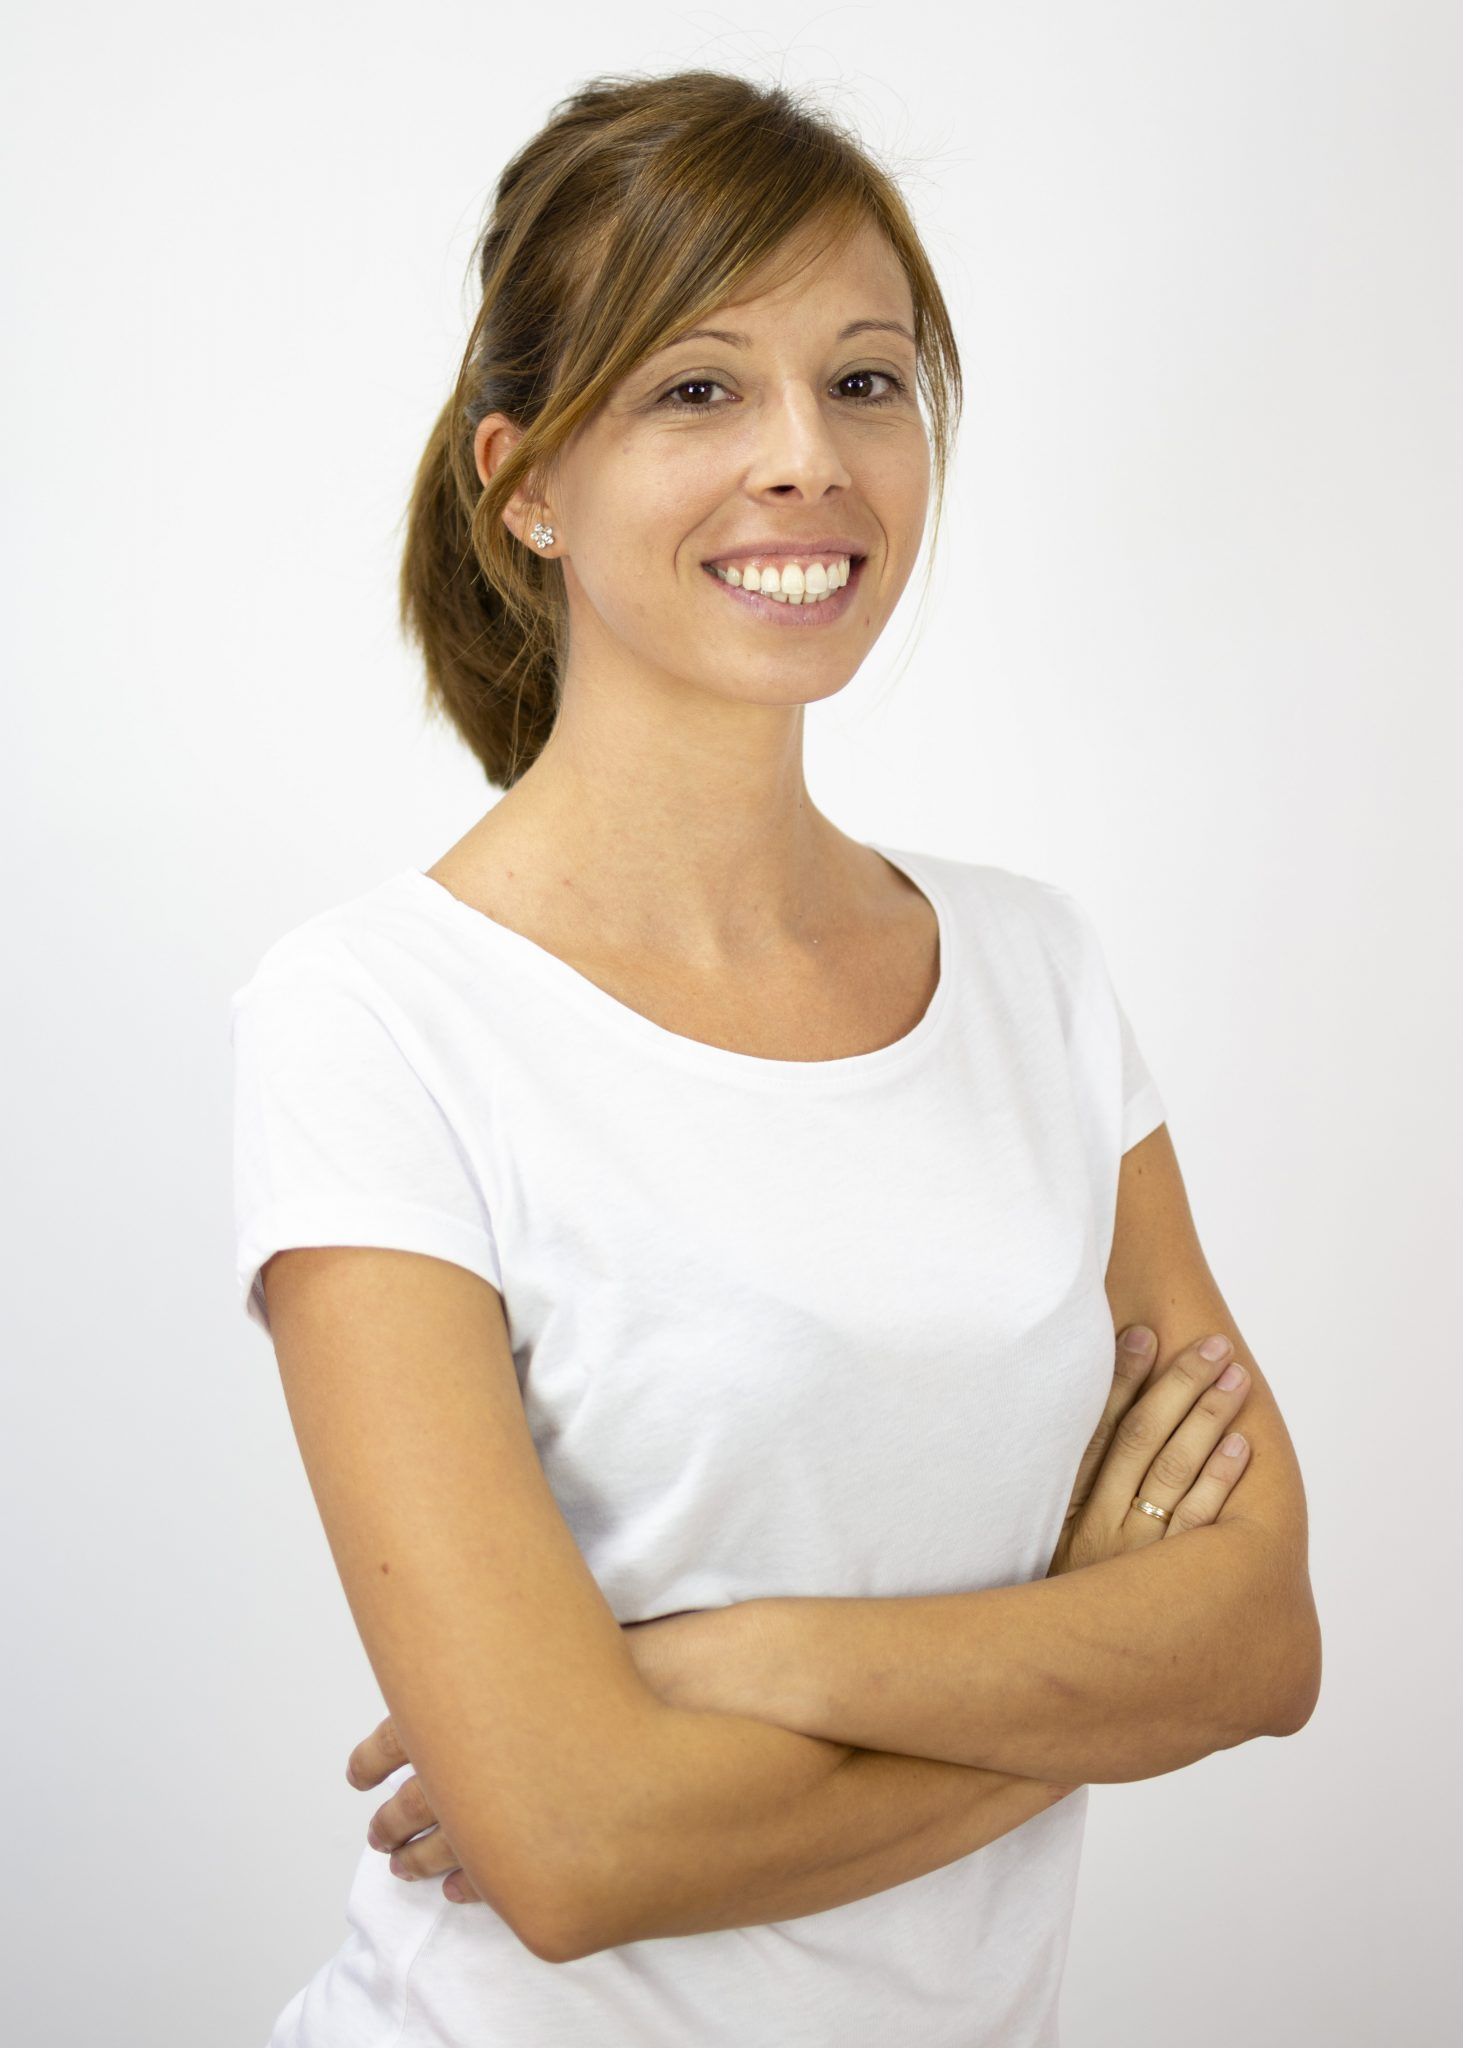 Irene González